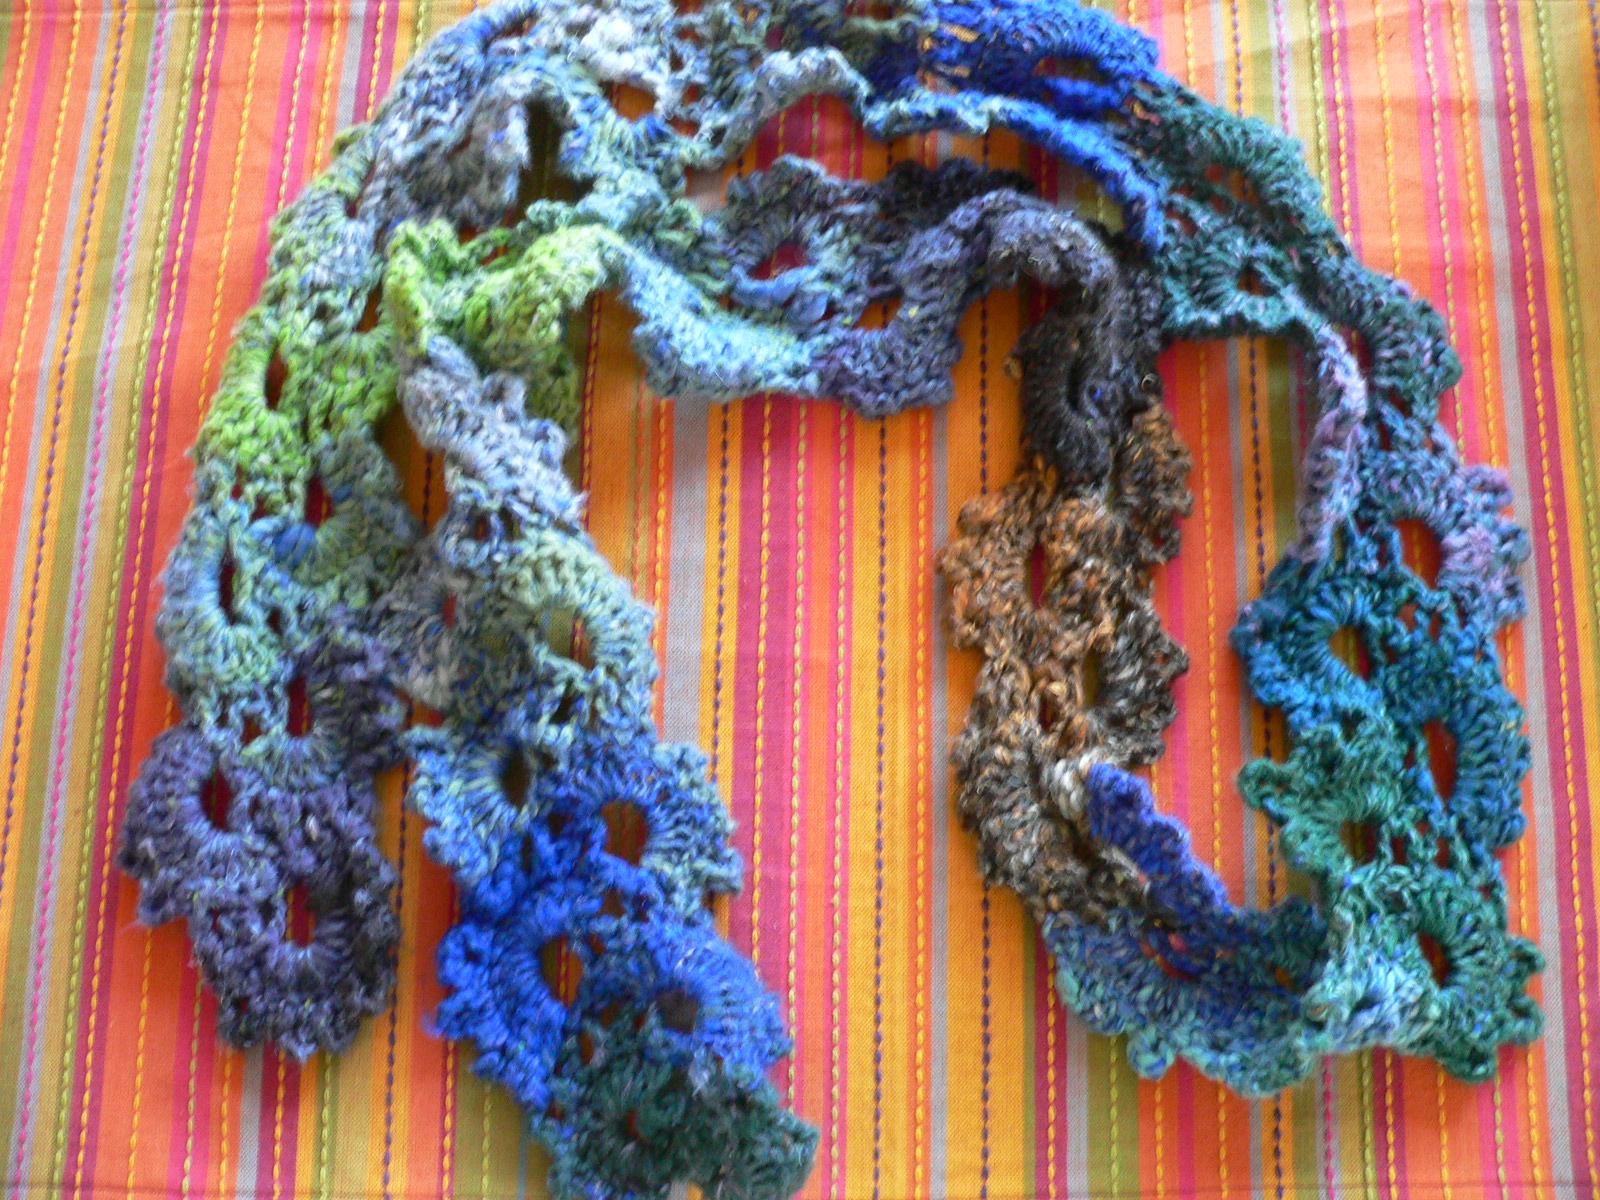 Knitting Ideas For Summer : Blickfangquilts and knits summer crochet